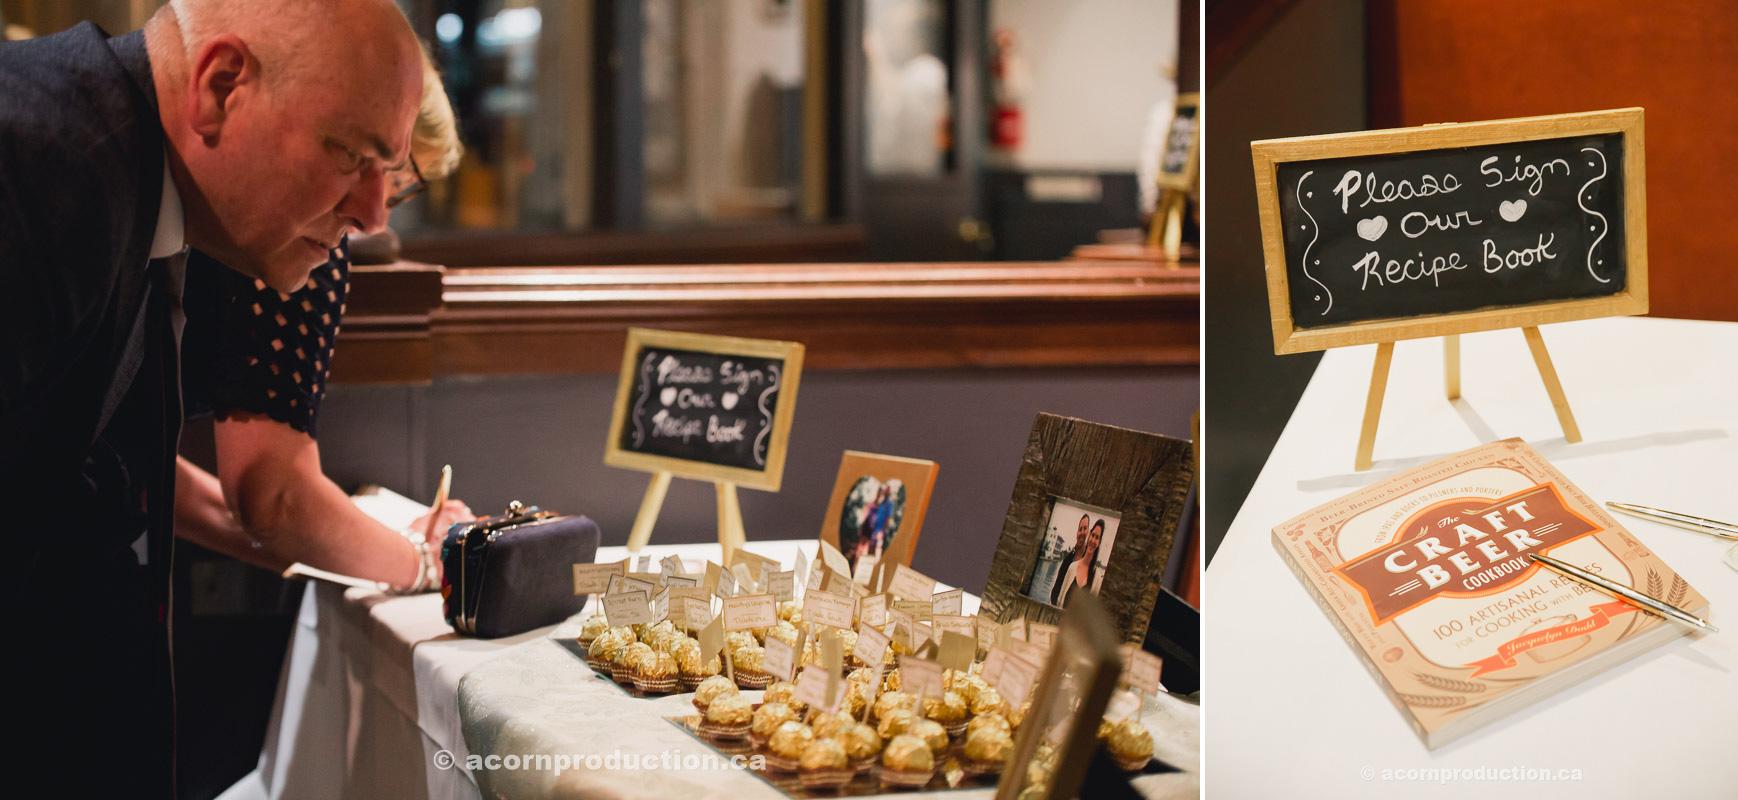 toronto-granite-brewery-wedding-photography-by-acornproduction.ca-15.jpg